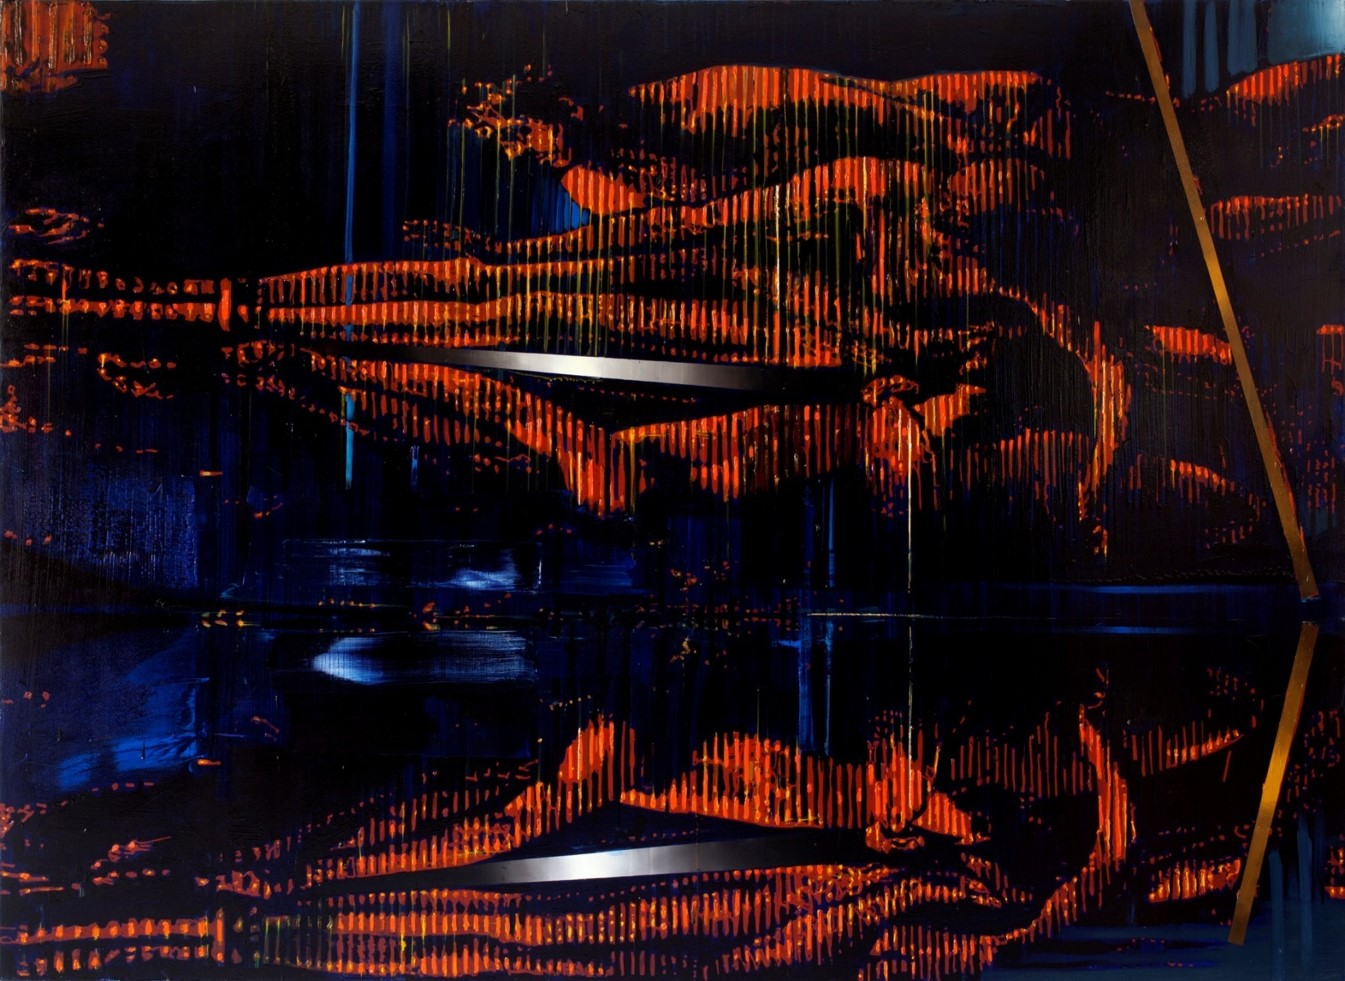 Oren Eliav, Peter, 2012, oil on canvas, 182 x 250 cm